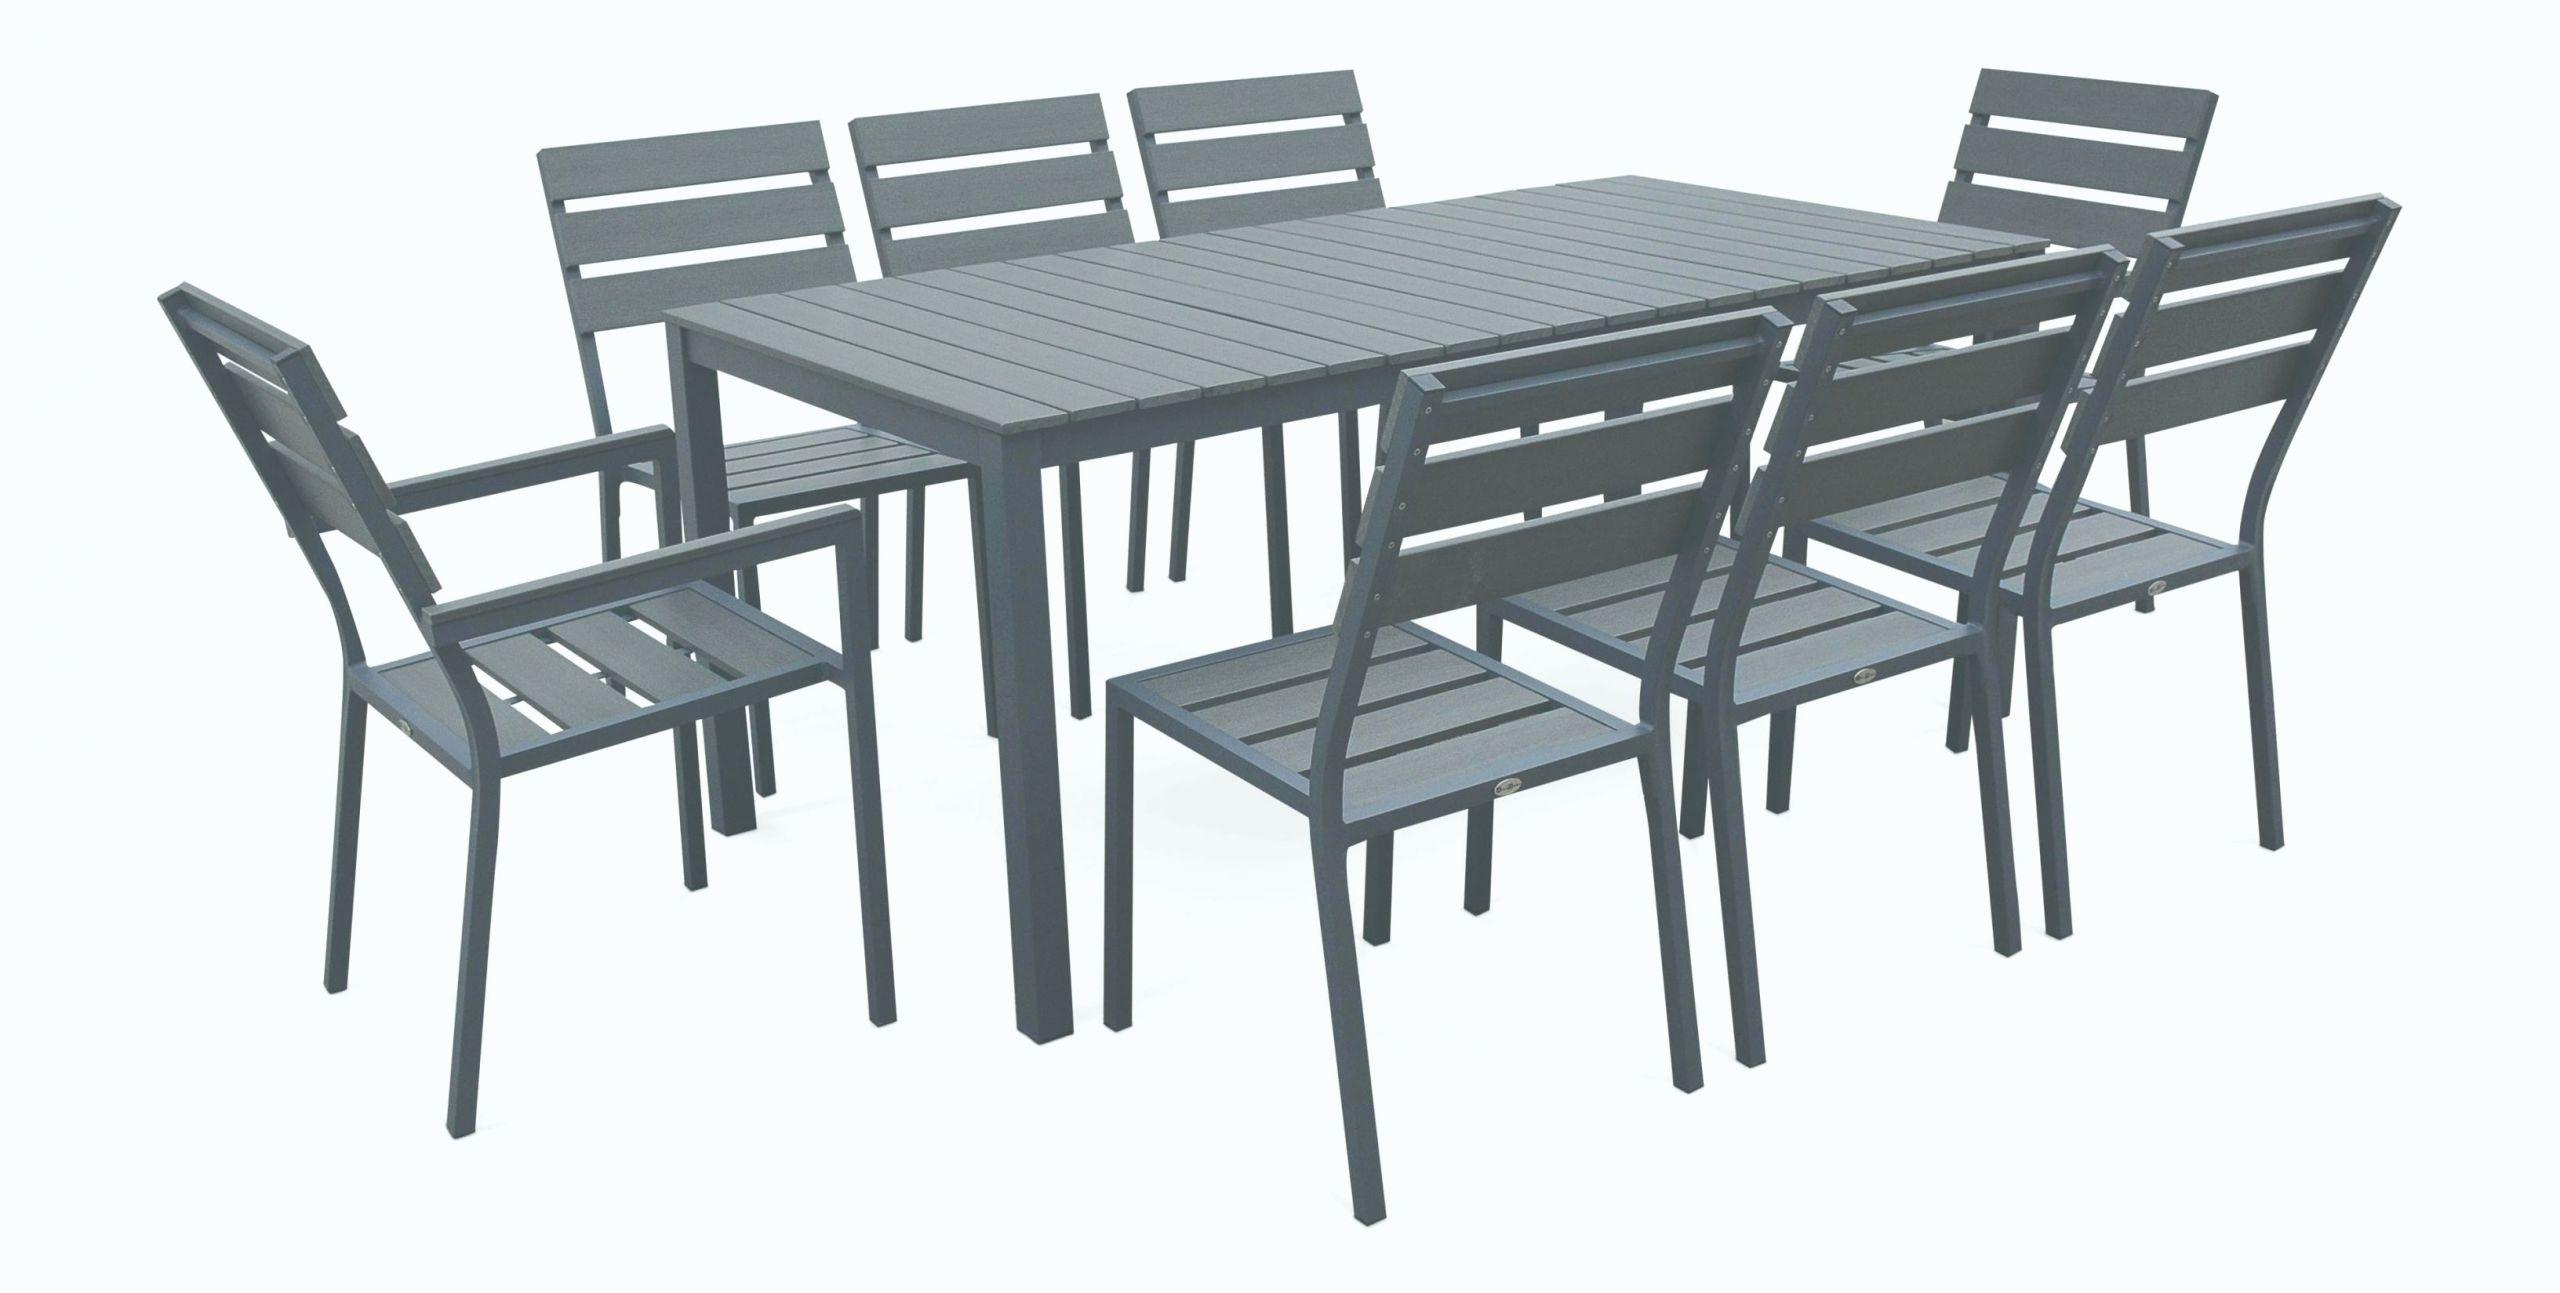 table de massage pliante luxe fantastique table de jardin bois pliante et 20 fresh table jardin of table de massage pliante